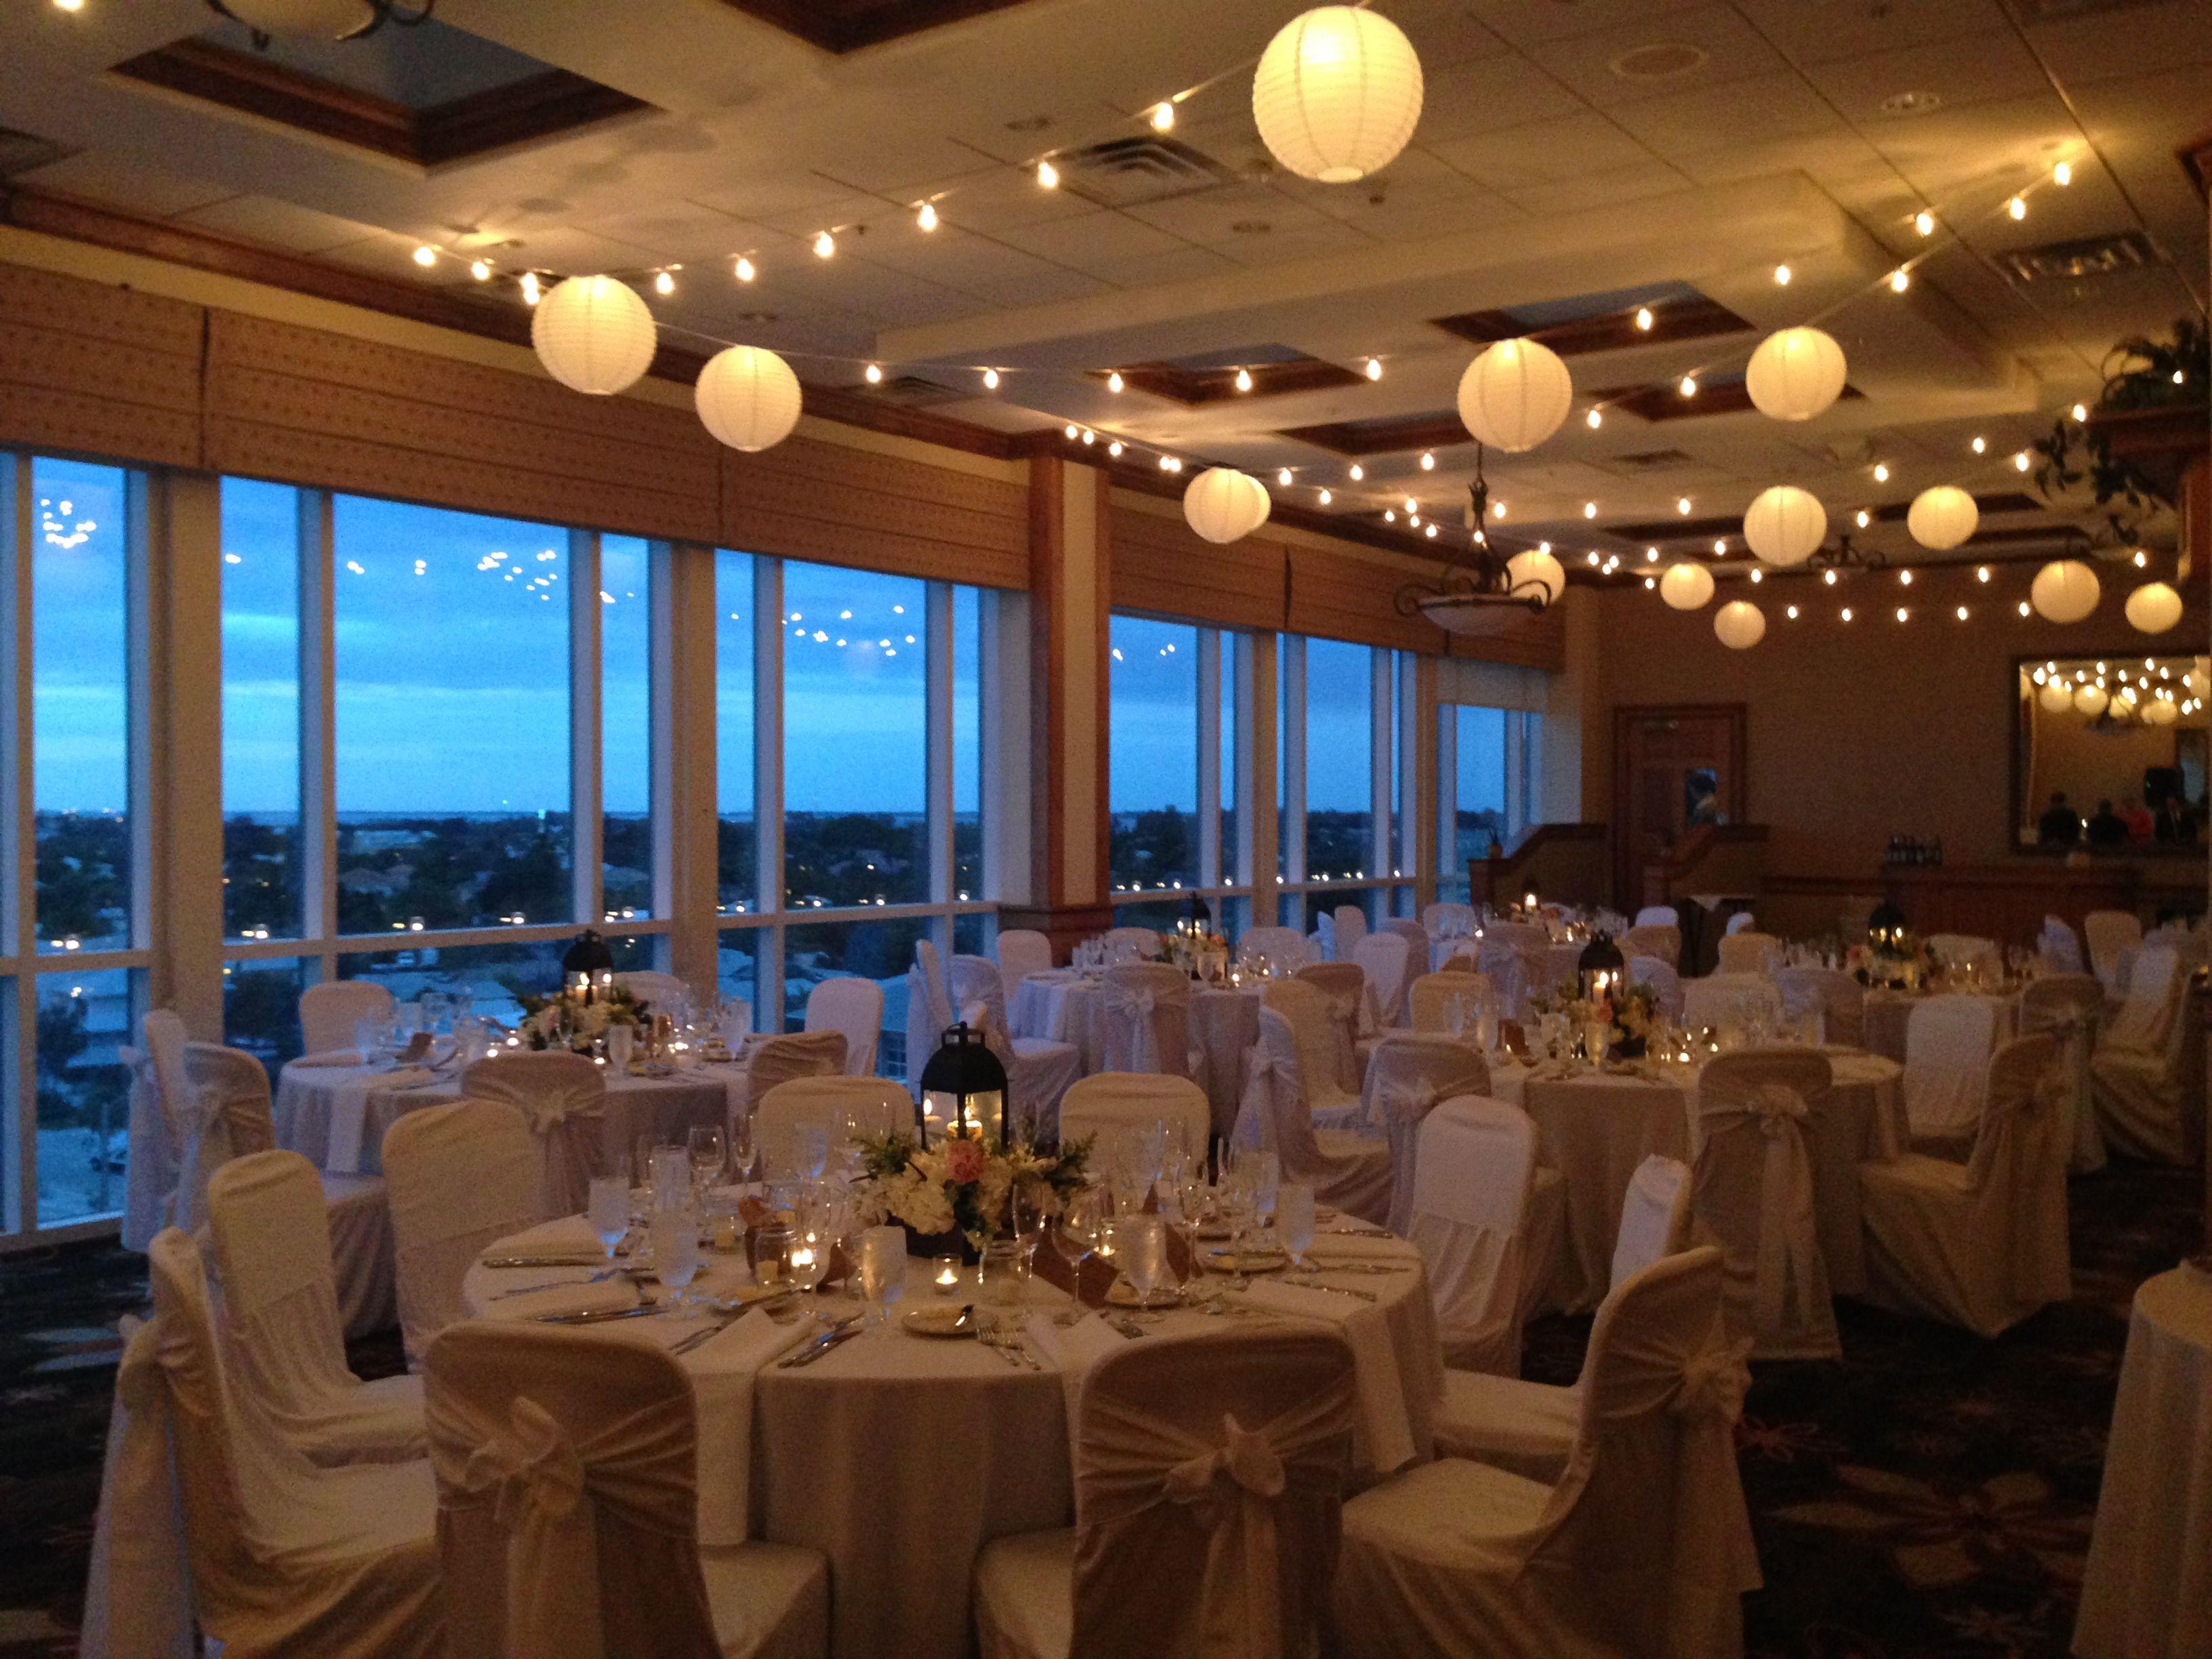 Lido Beach Resort Wedding Reception Venues In Sarasota Florida